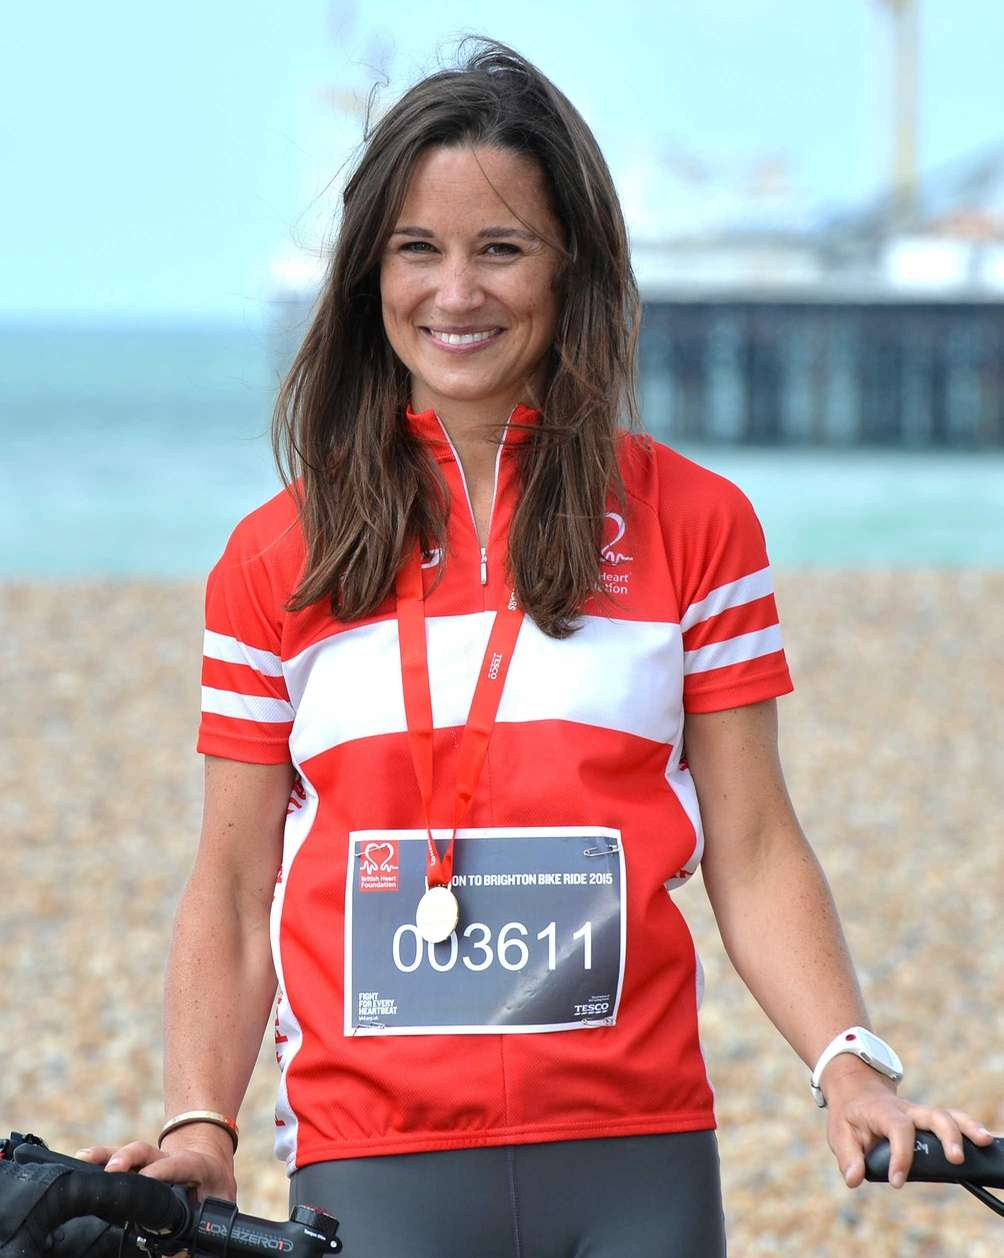 Pippa Middleton finishes the London to Brighton Bike